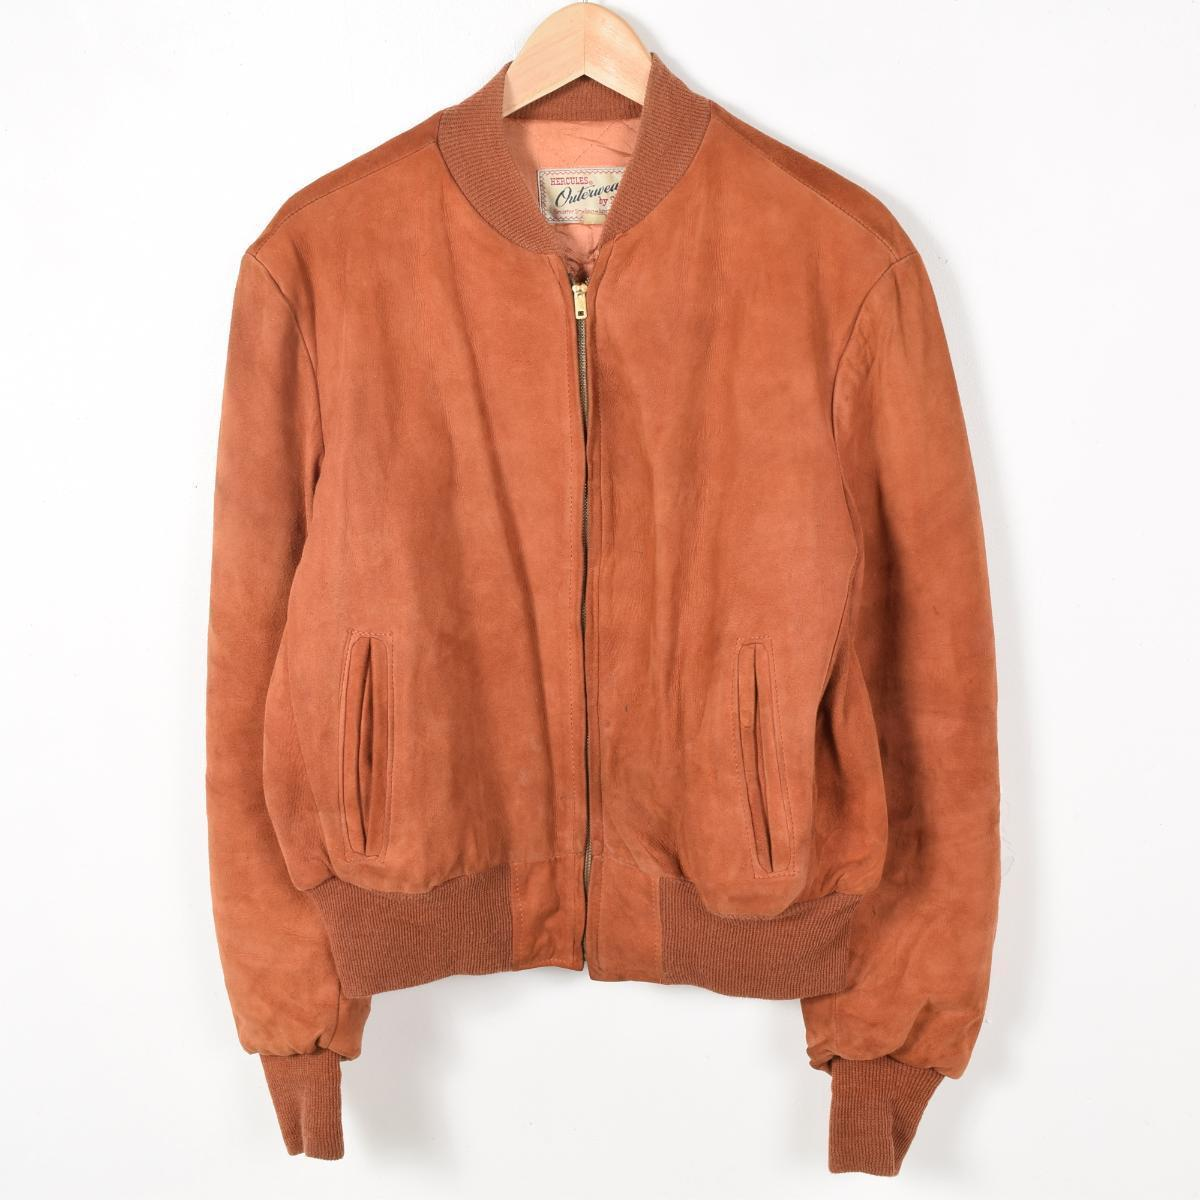 fad0711e 50s Sears HERCULES Hercules USA-Ma-1 jacket mens M vintage Sears /weu2432.